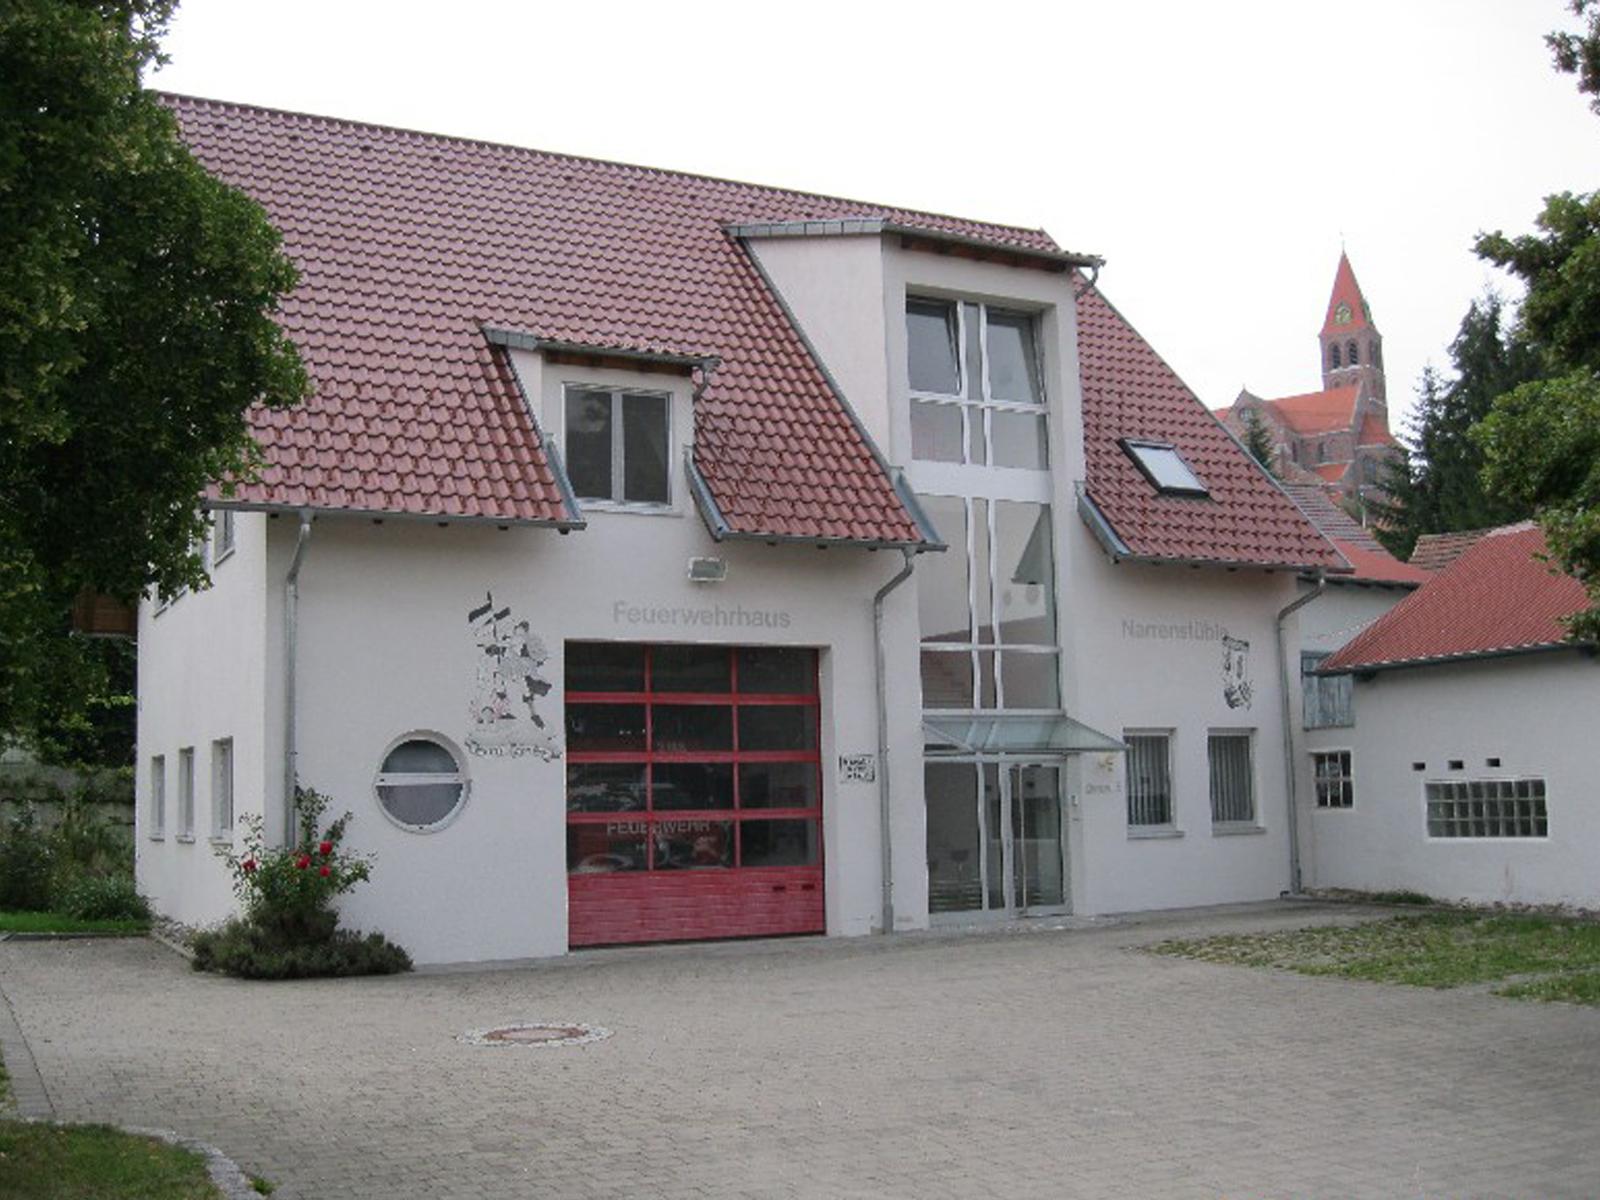 Abbildung des Feuerwehrhaus Hundersingen